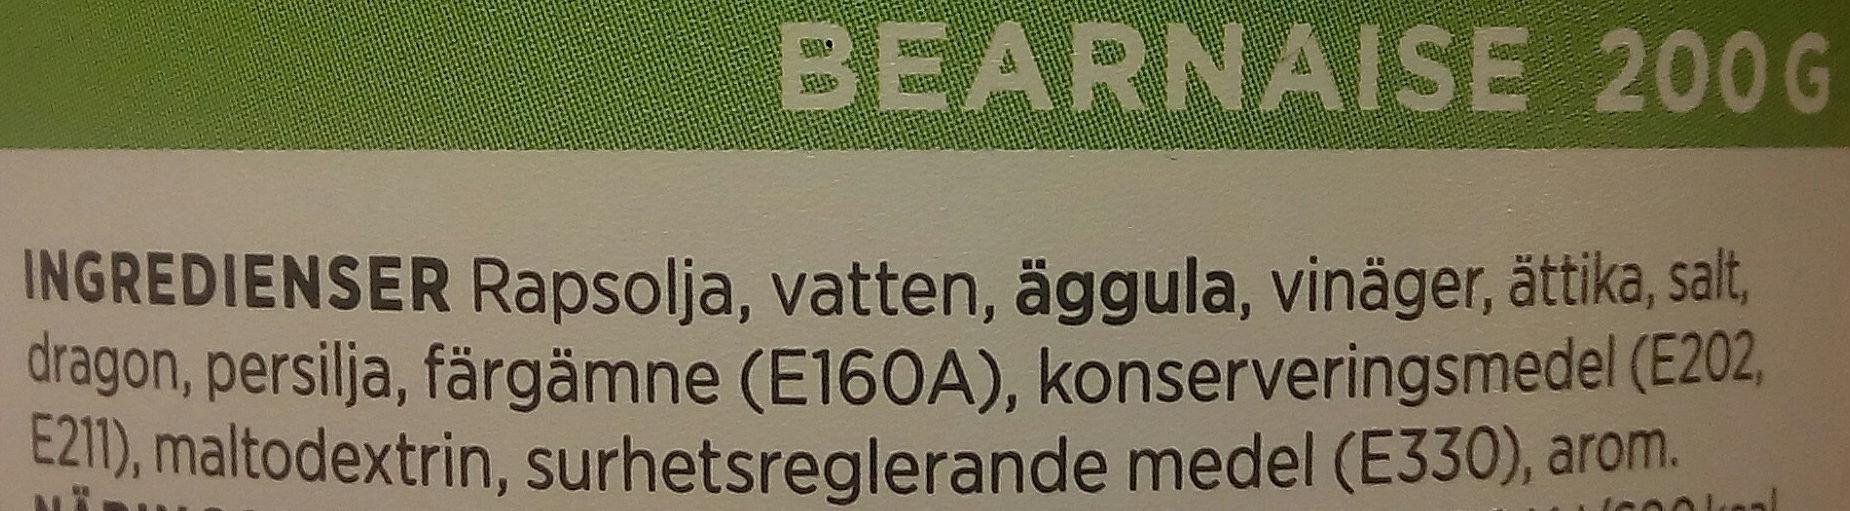 ICA Bearnaise - Ingrédients - sv